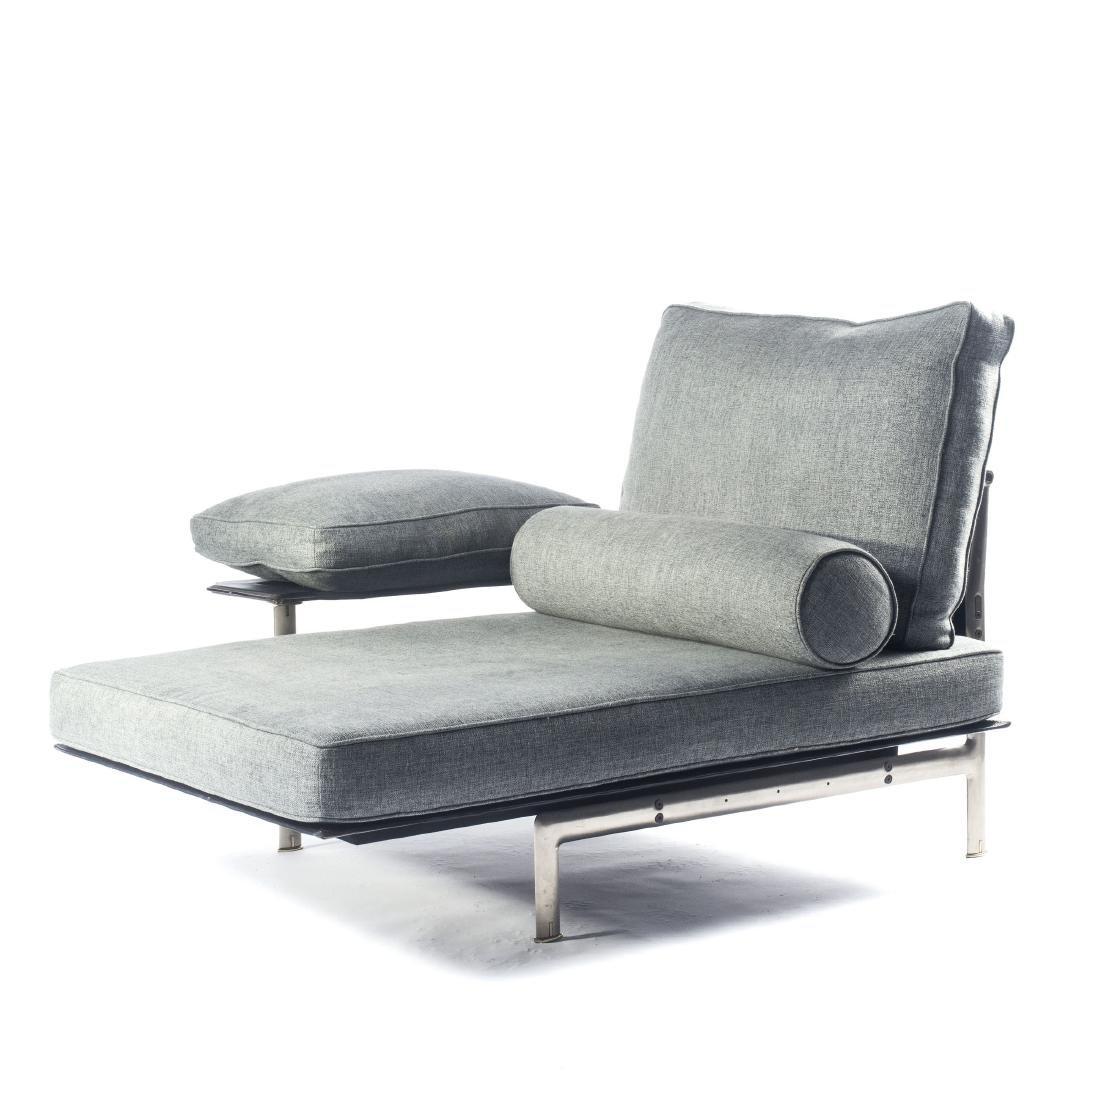 Two 'Diesis' long chairs, 1979